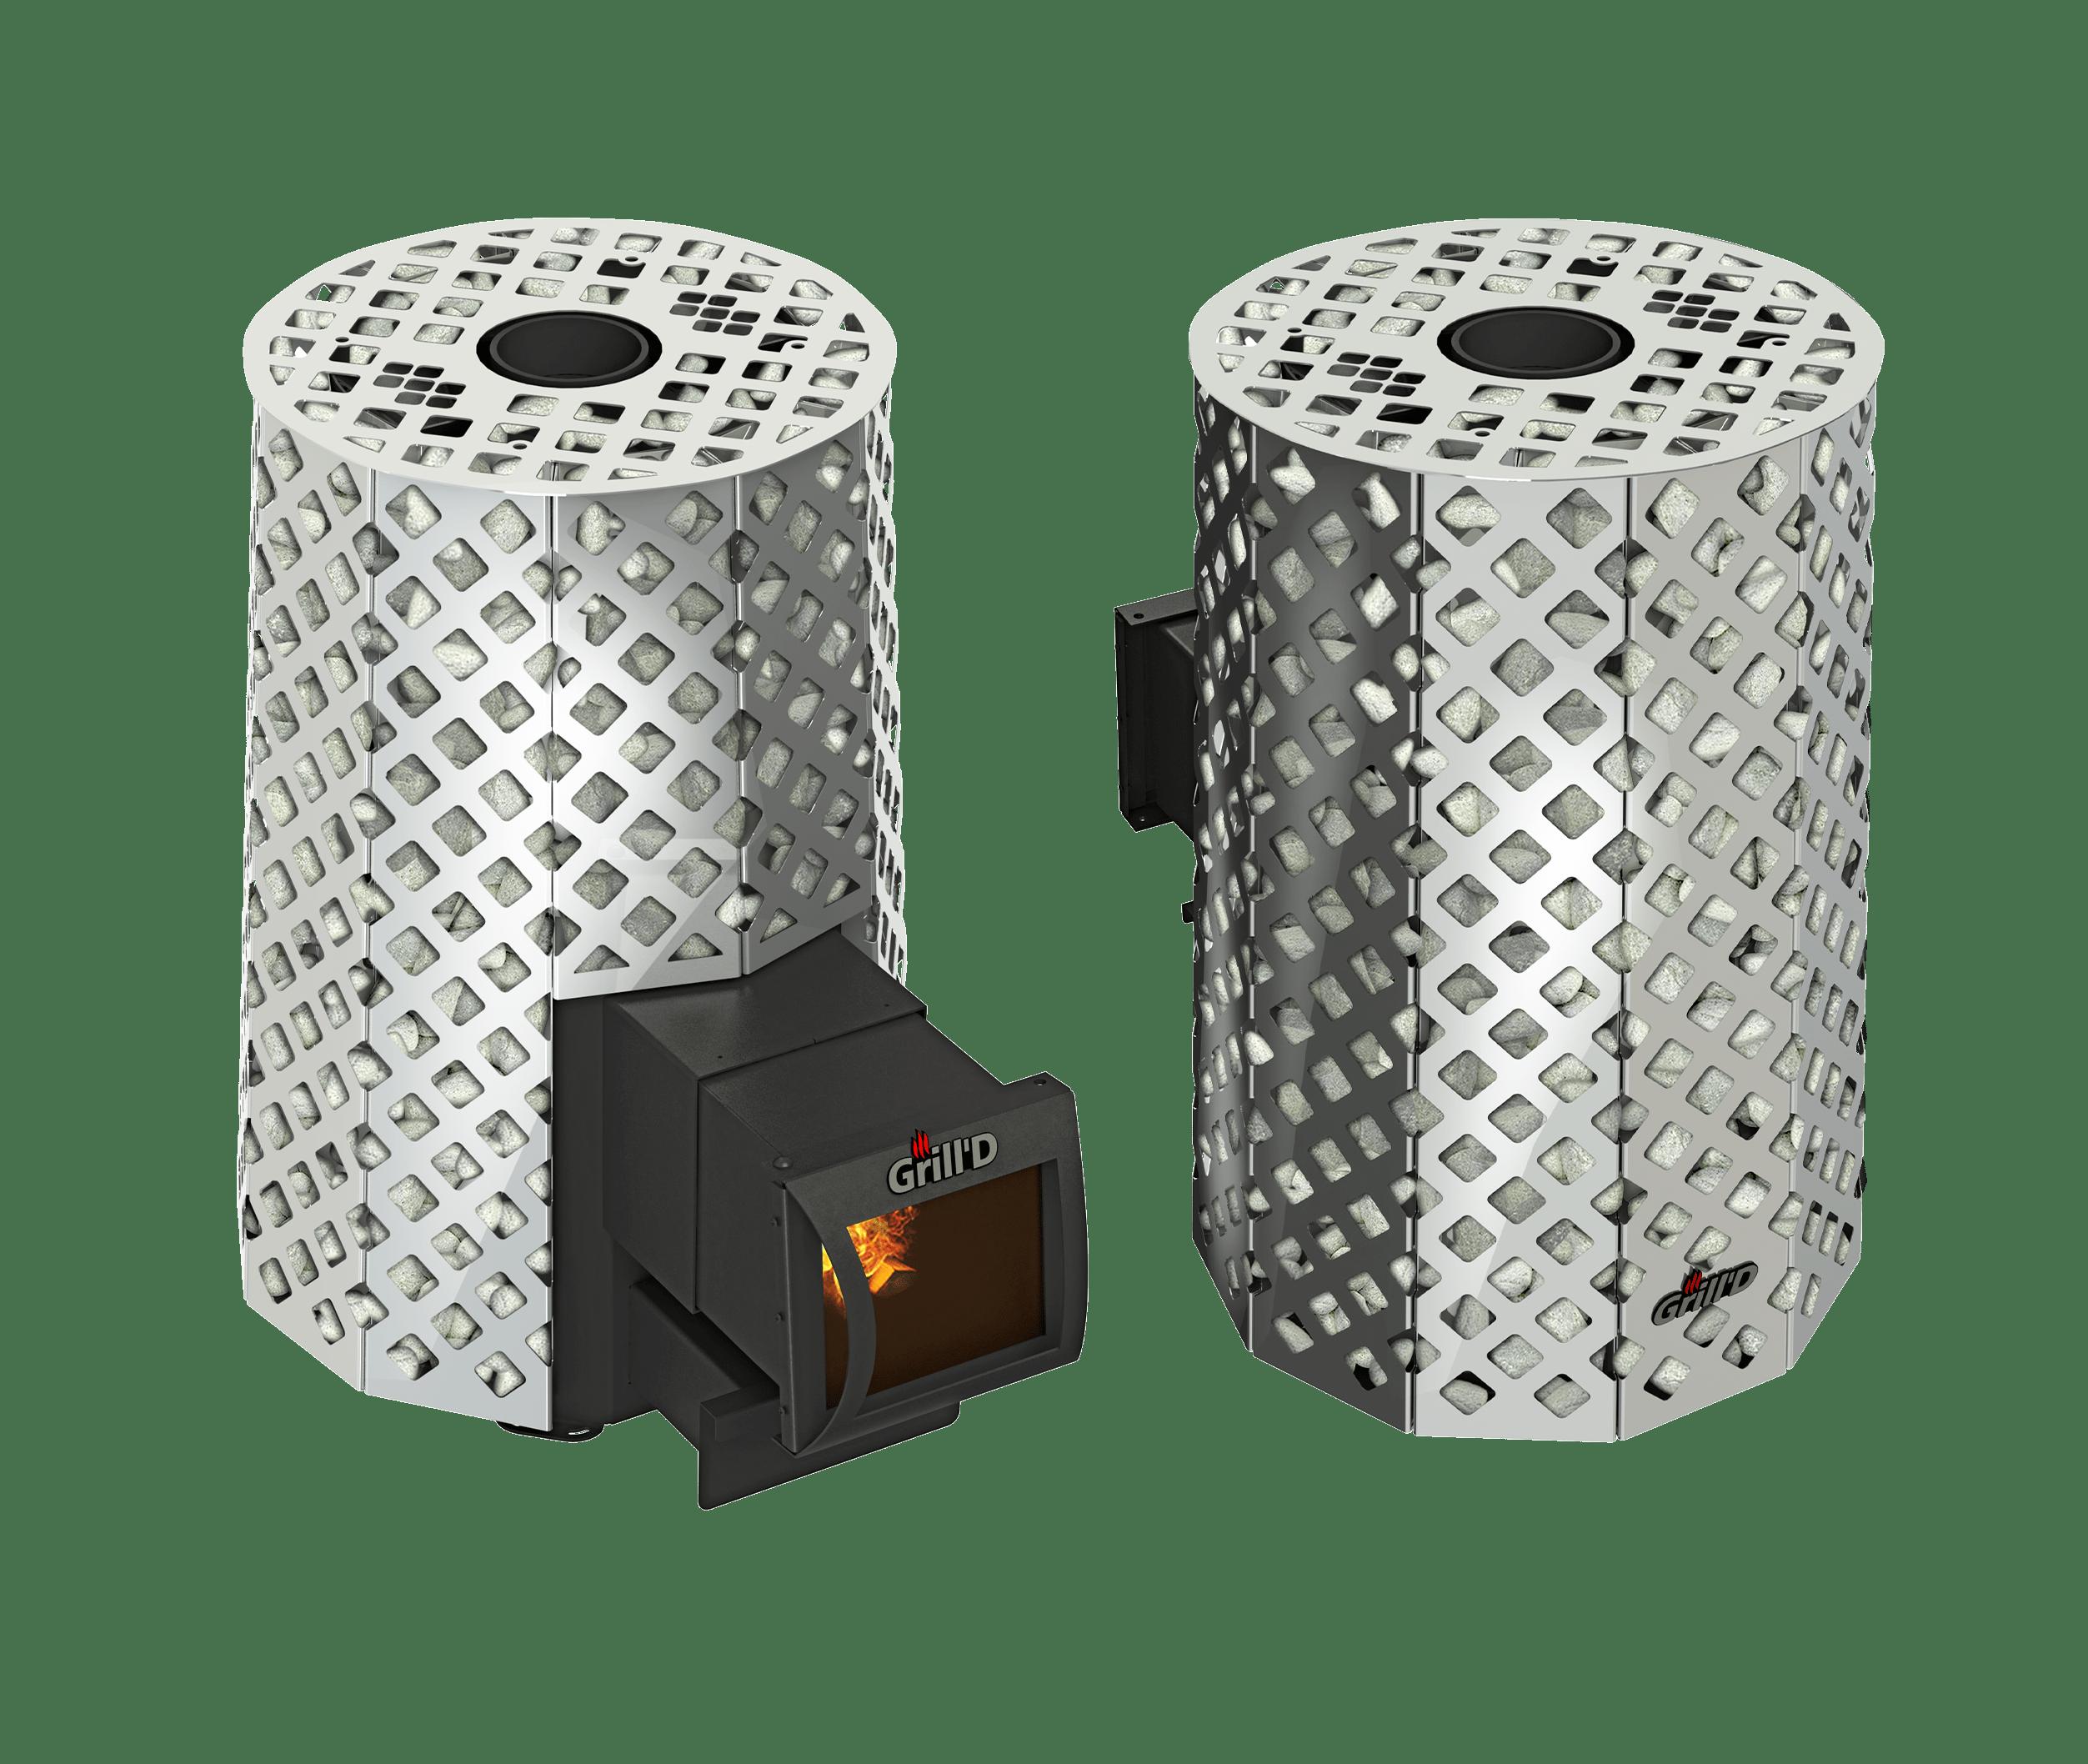 Банная печь Grill'D Violet Steel Romb Long (Жадеит 100 кг)